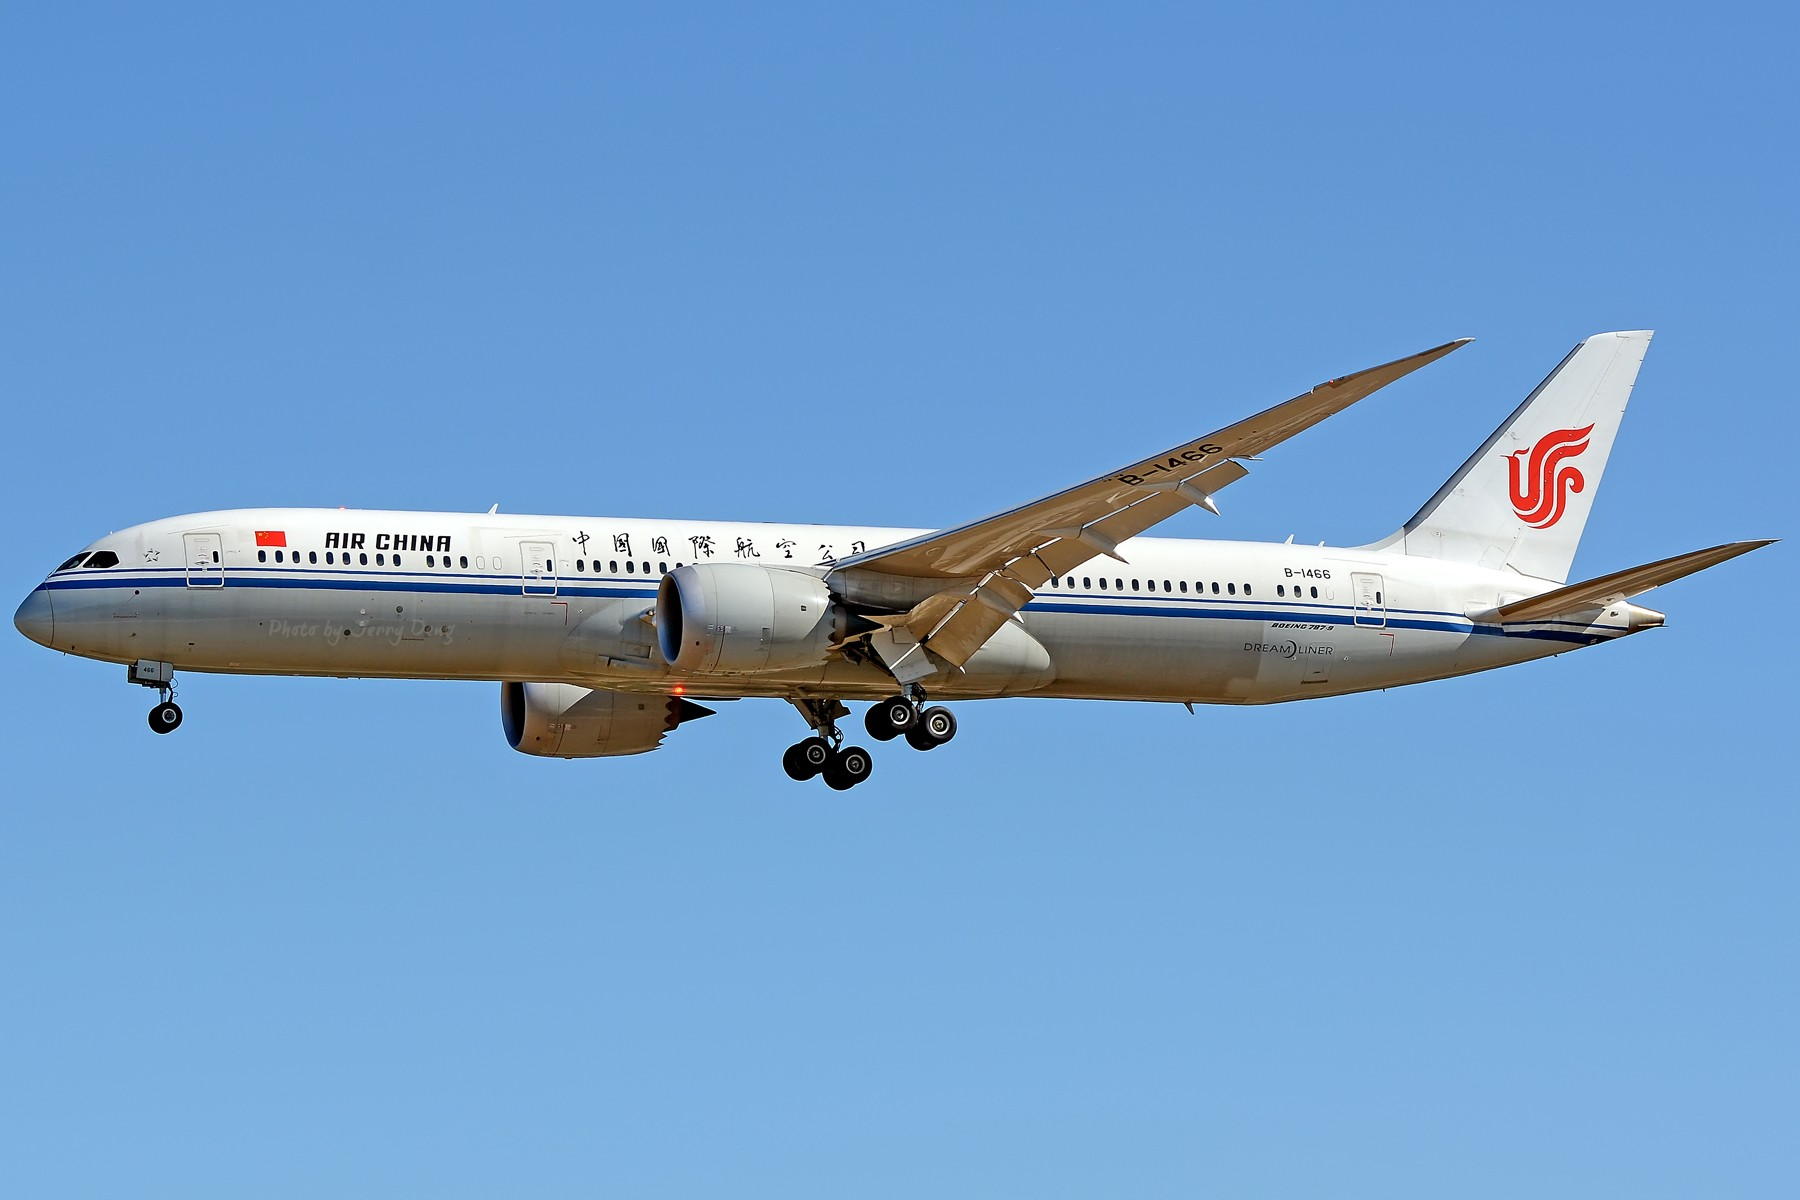 Re:[原创]【多图党】PEK落地一组国航系【2】 BOEING 787-9 B-1466 中国北京首都国际机场